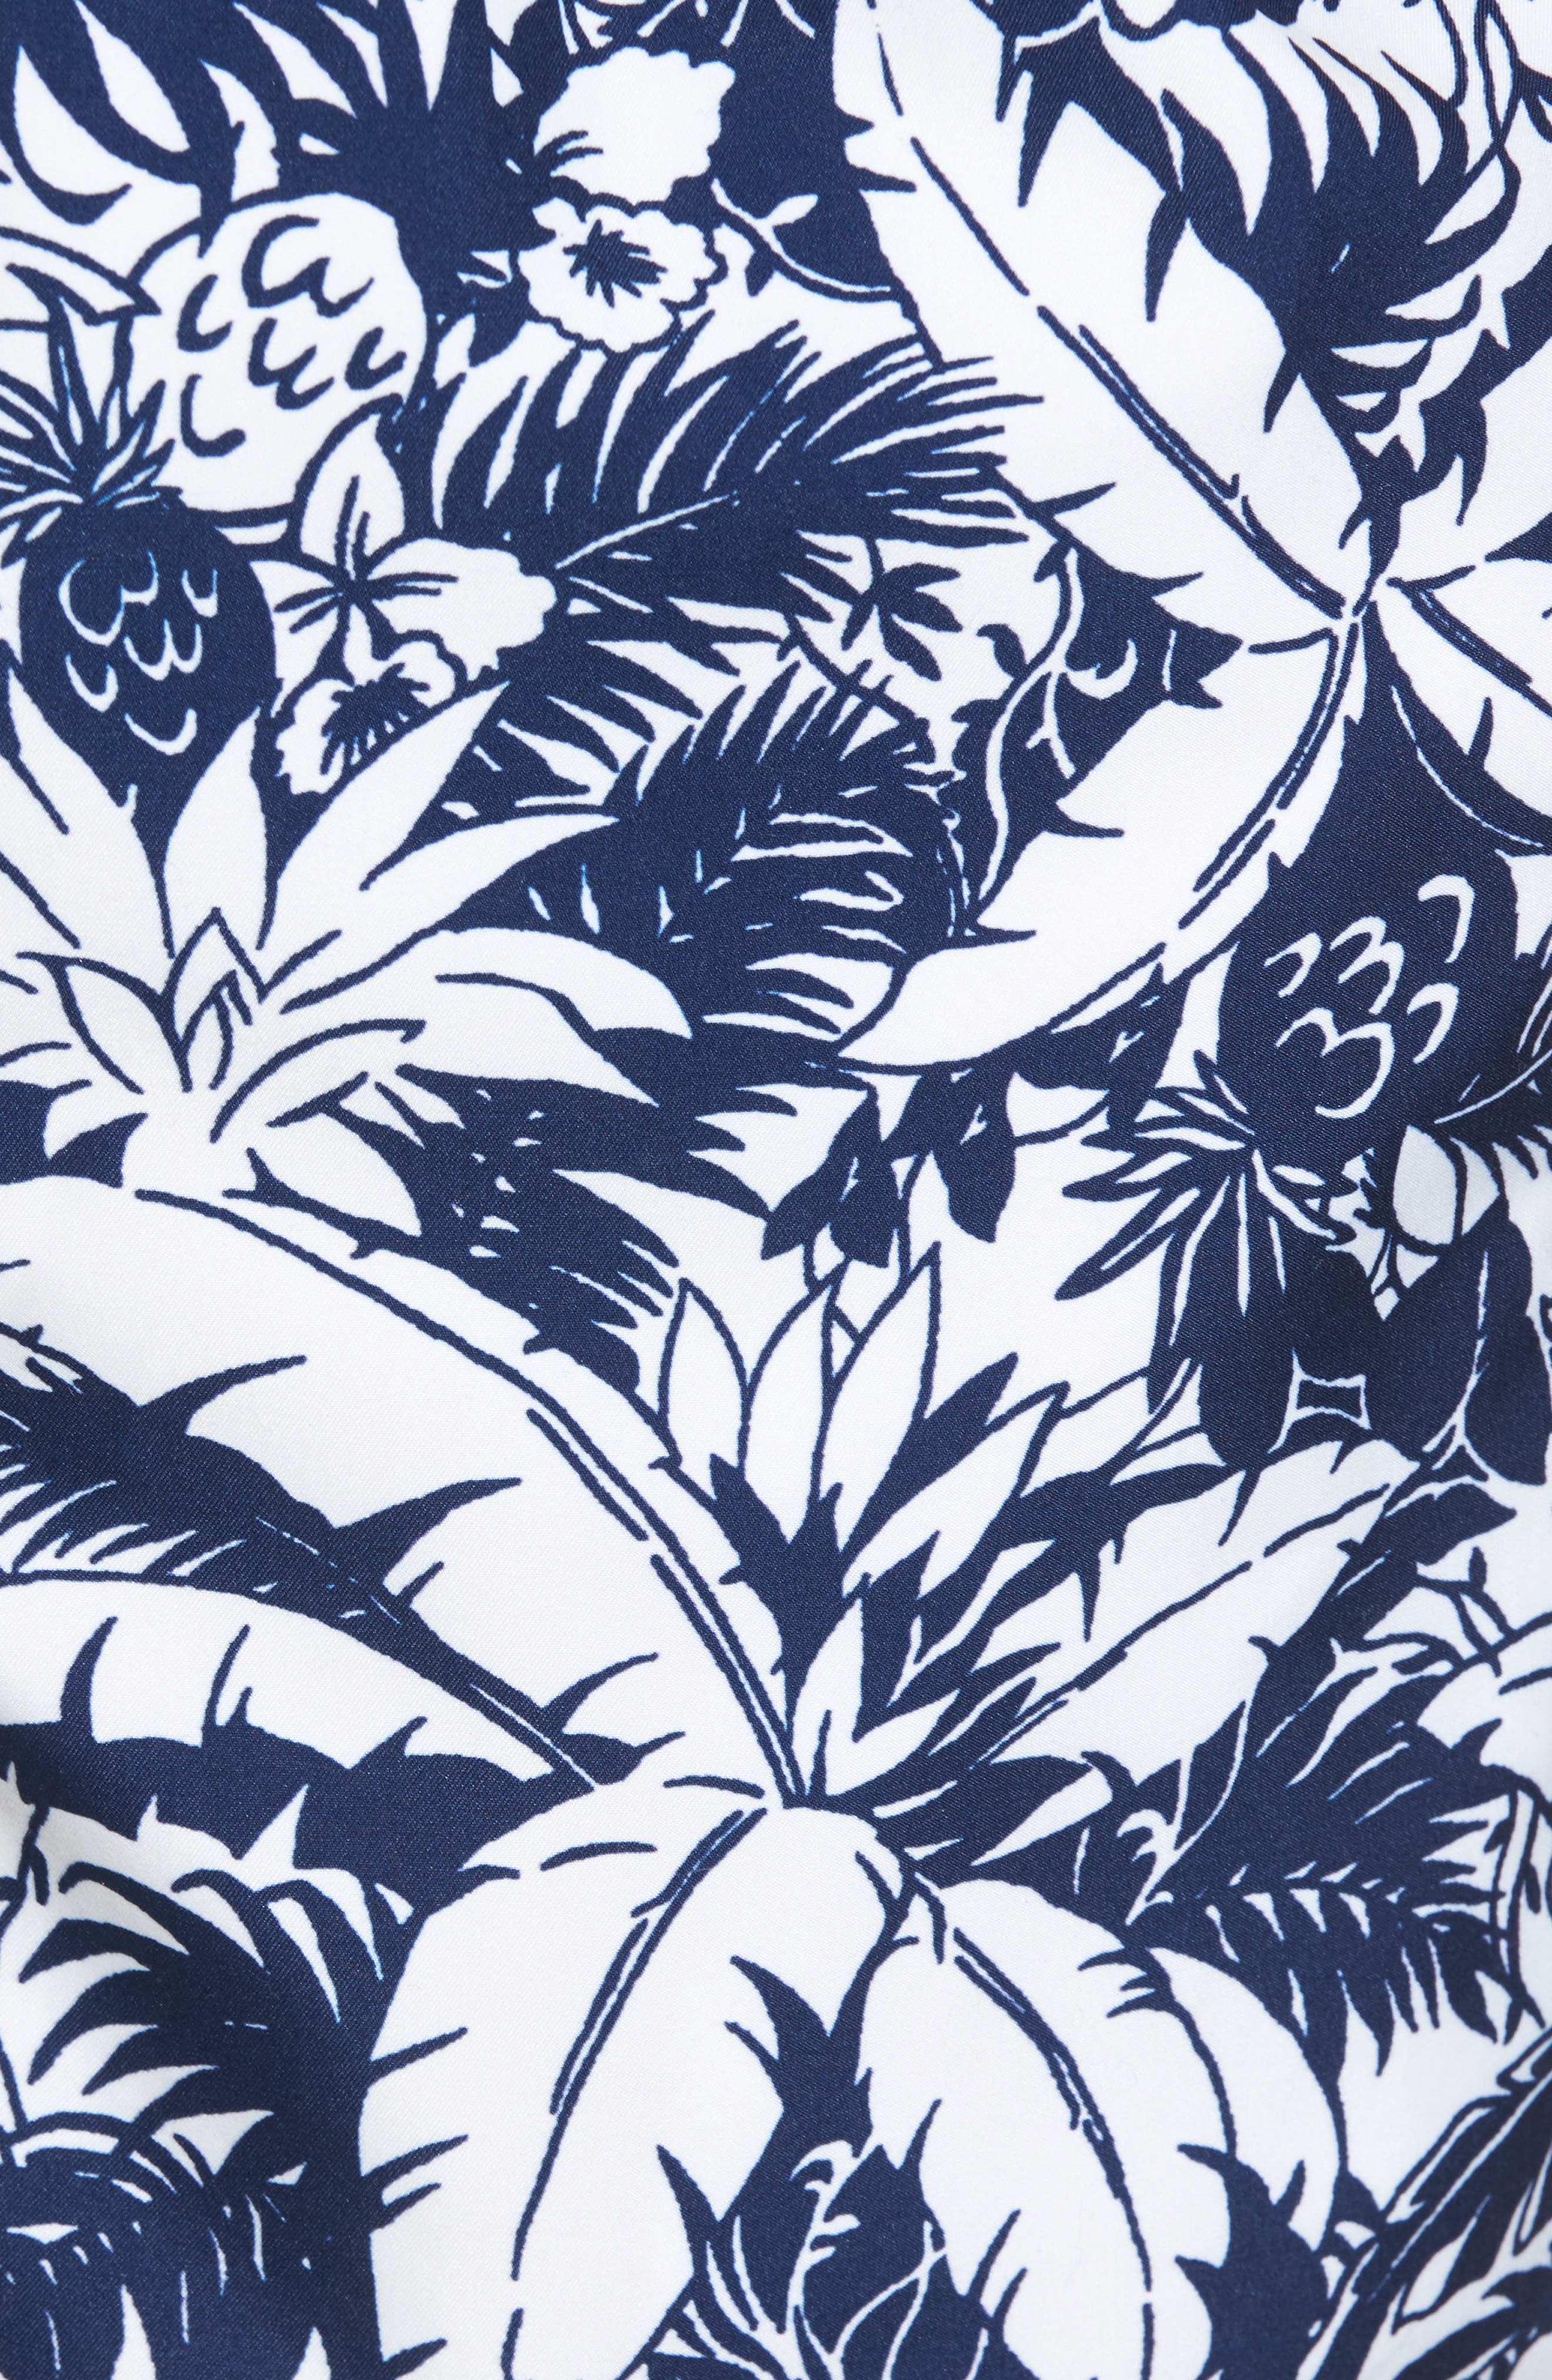 Chappy Pineapple in Palms Swim Trunks,                             Alternate thumbnail 5, color,                             Deep Bay